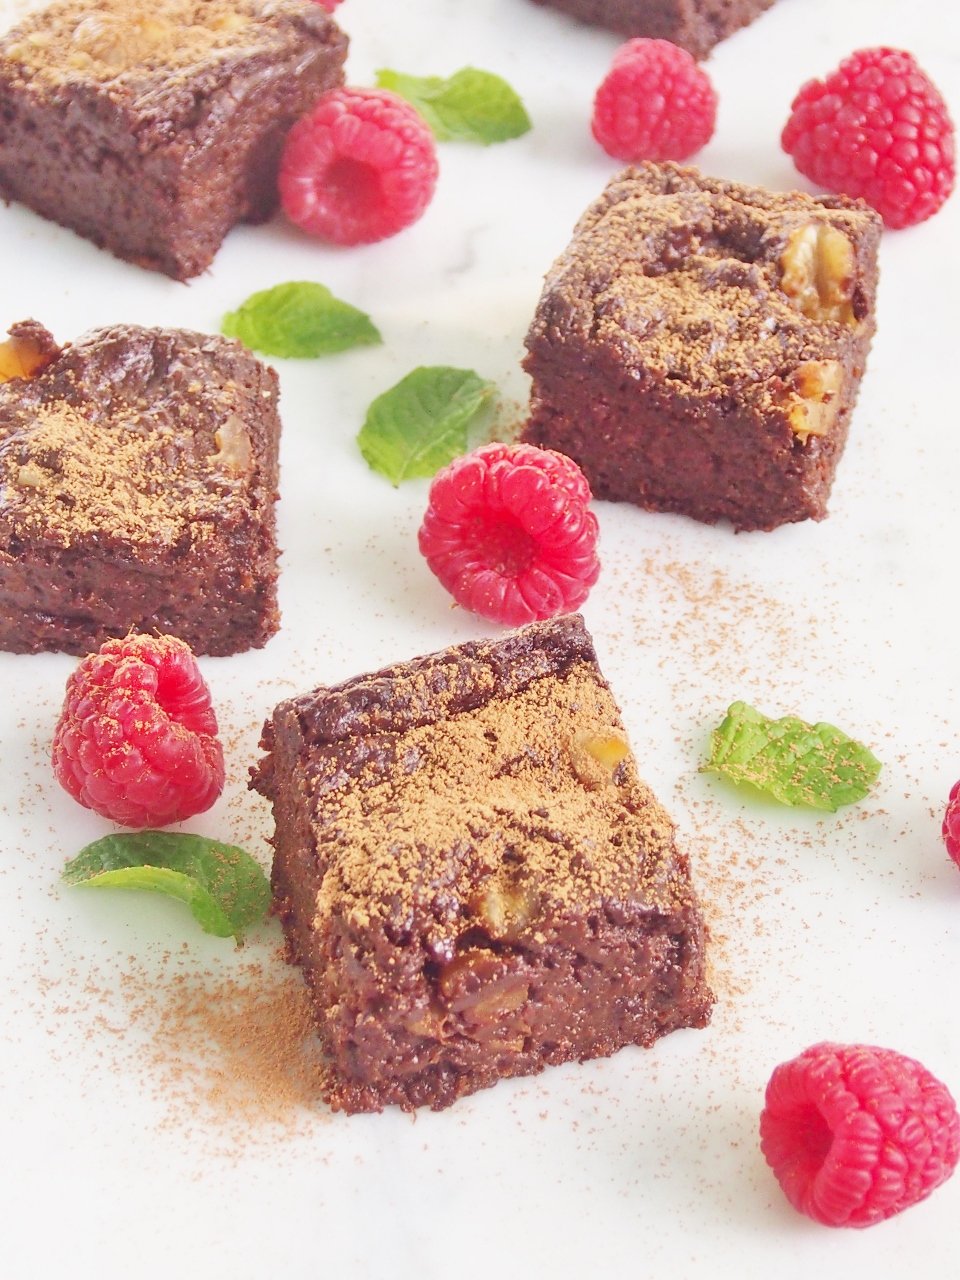 chocolate prune and walnut brownies